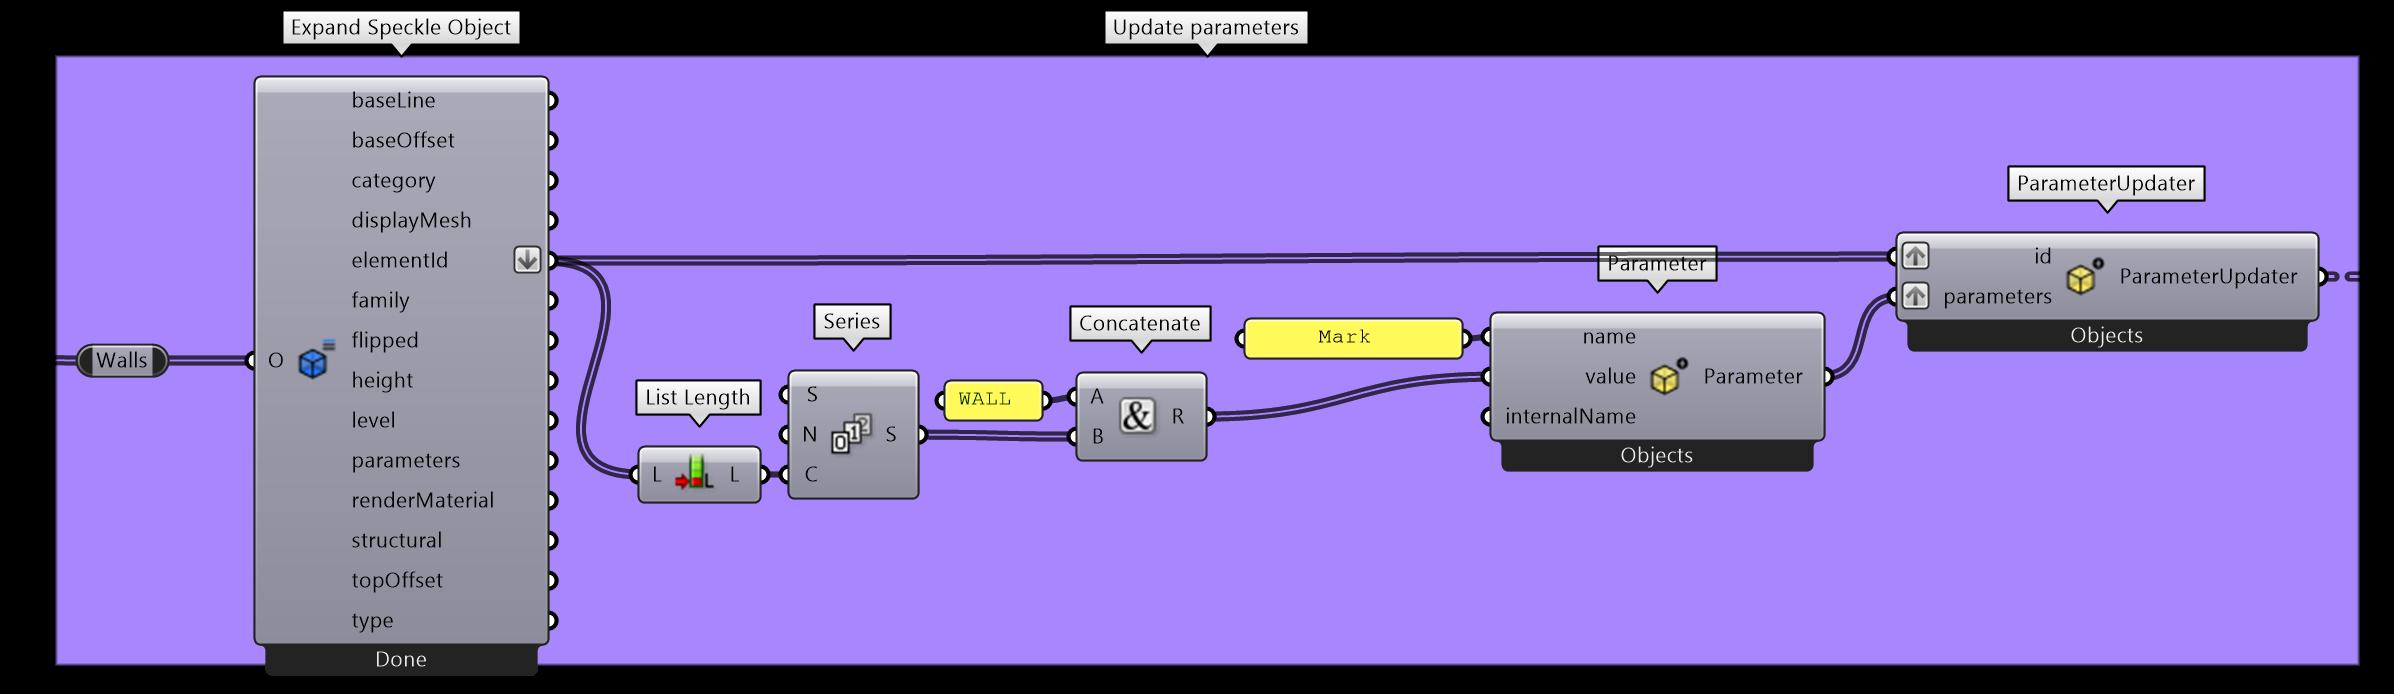 Creating parameter updates